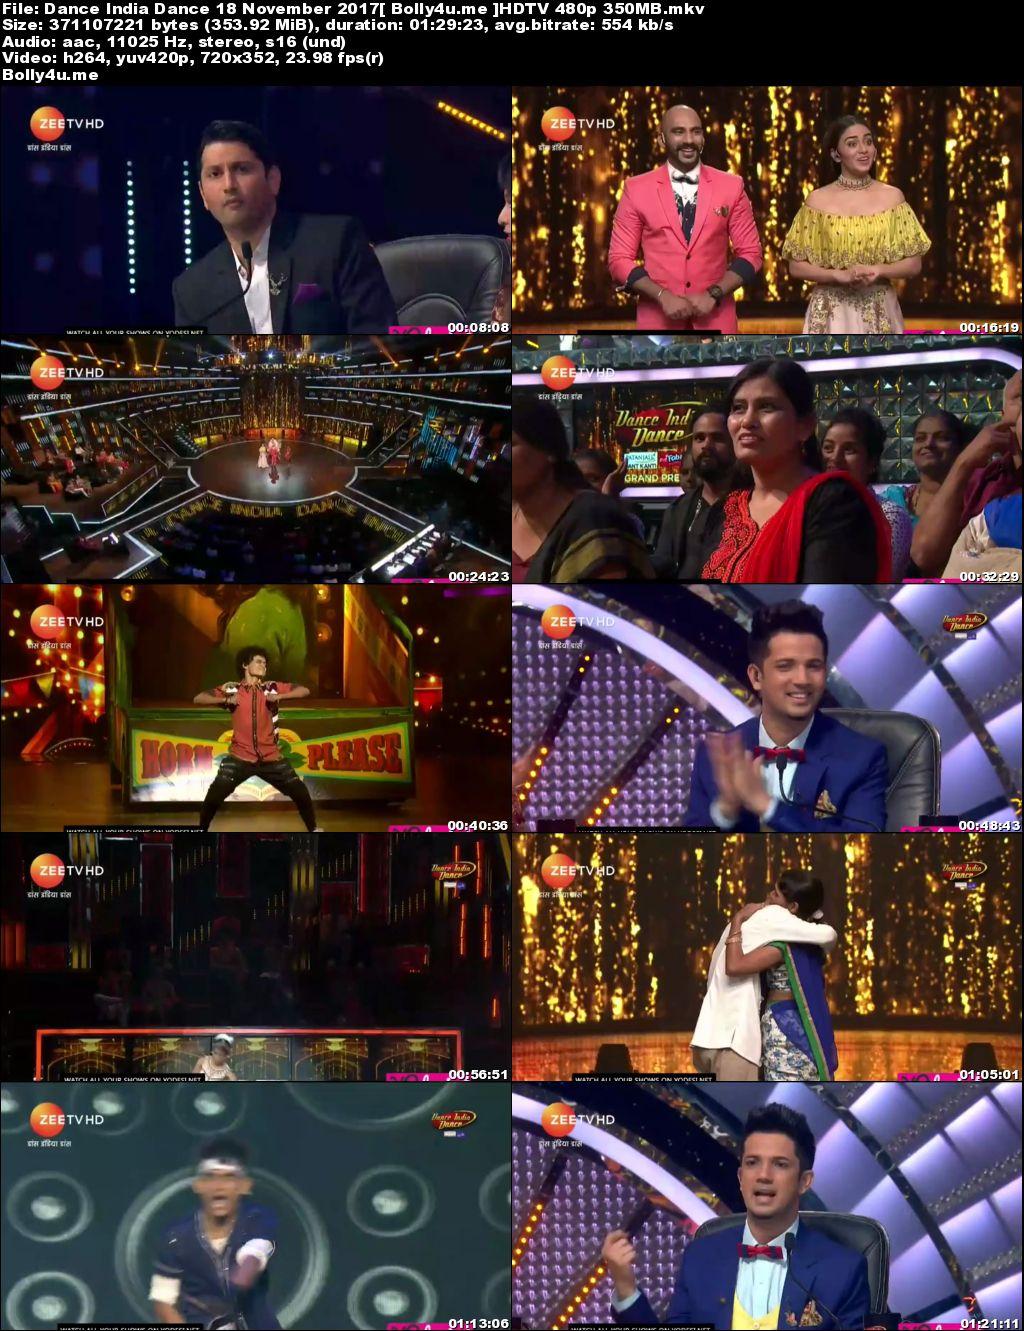 Dance India Dance HDTV 480p 350MB 18 November 2017 Download